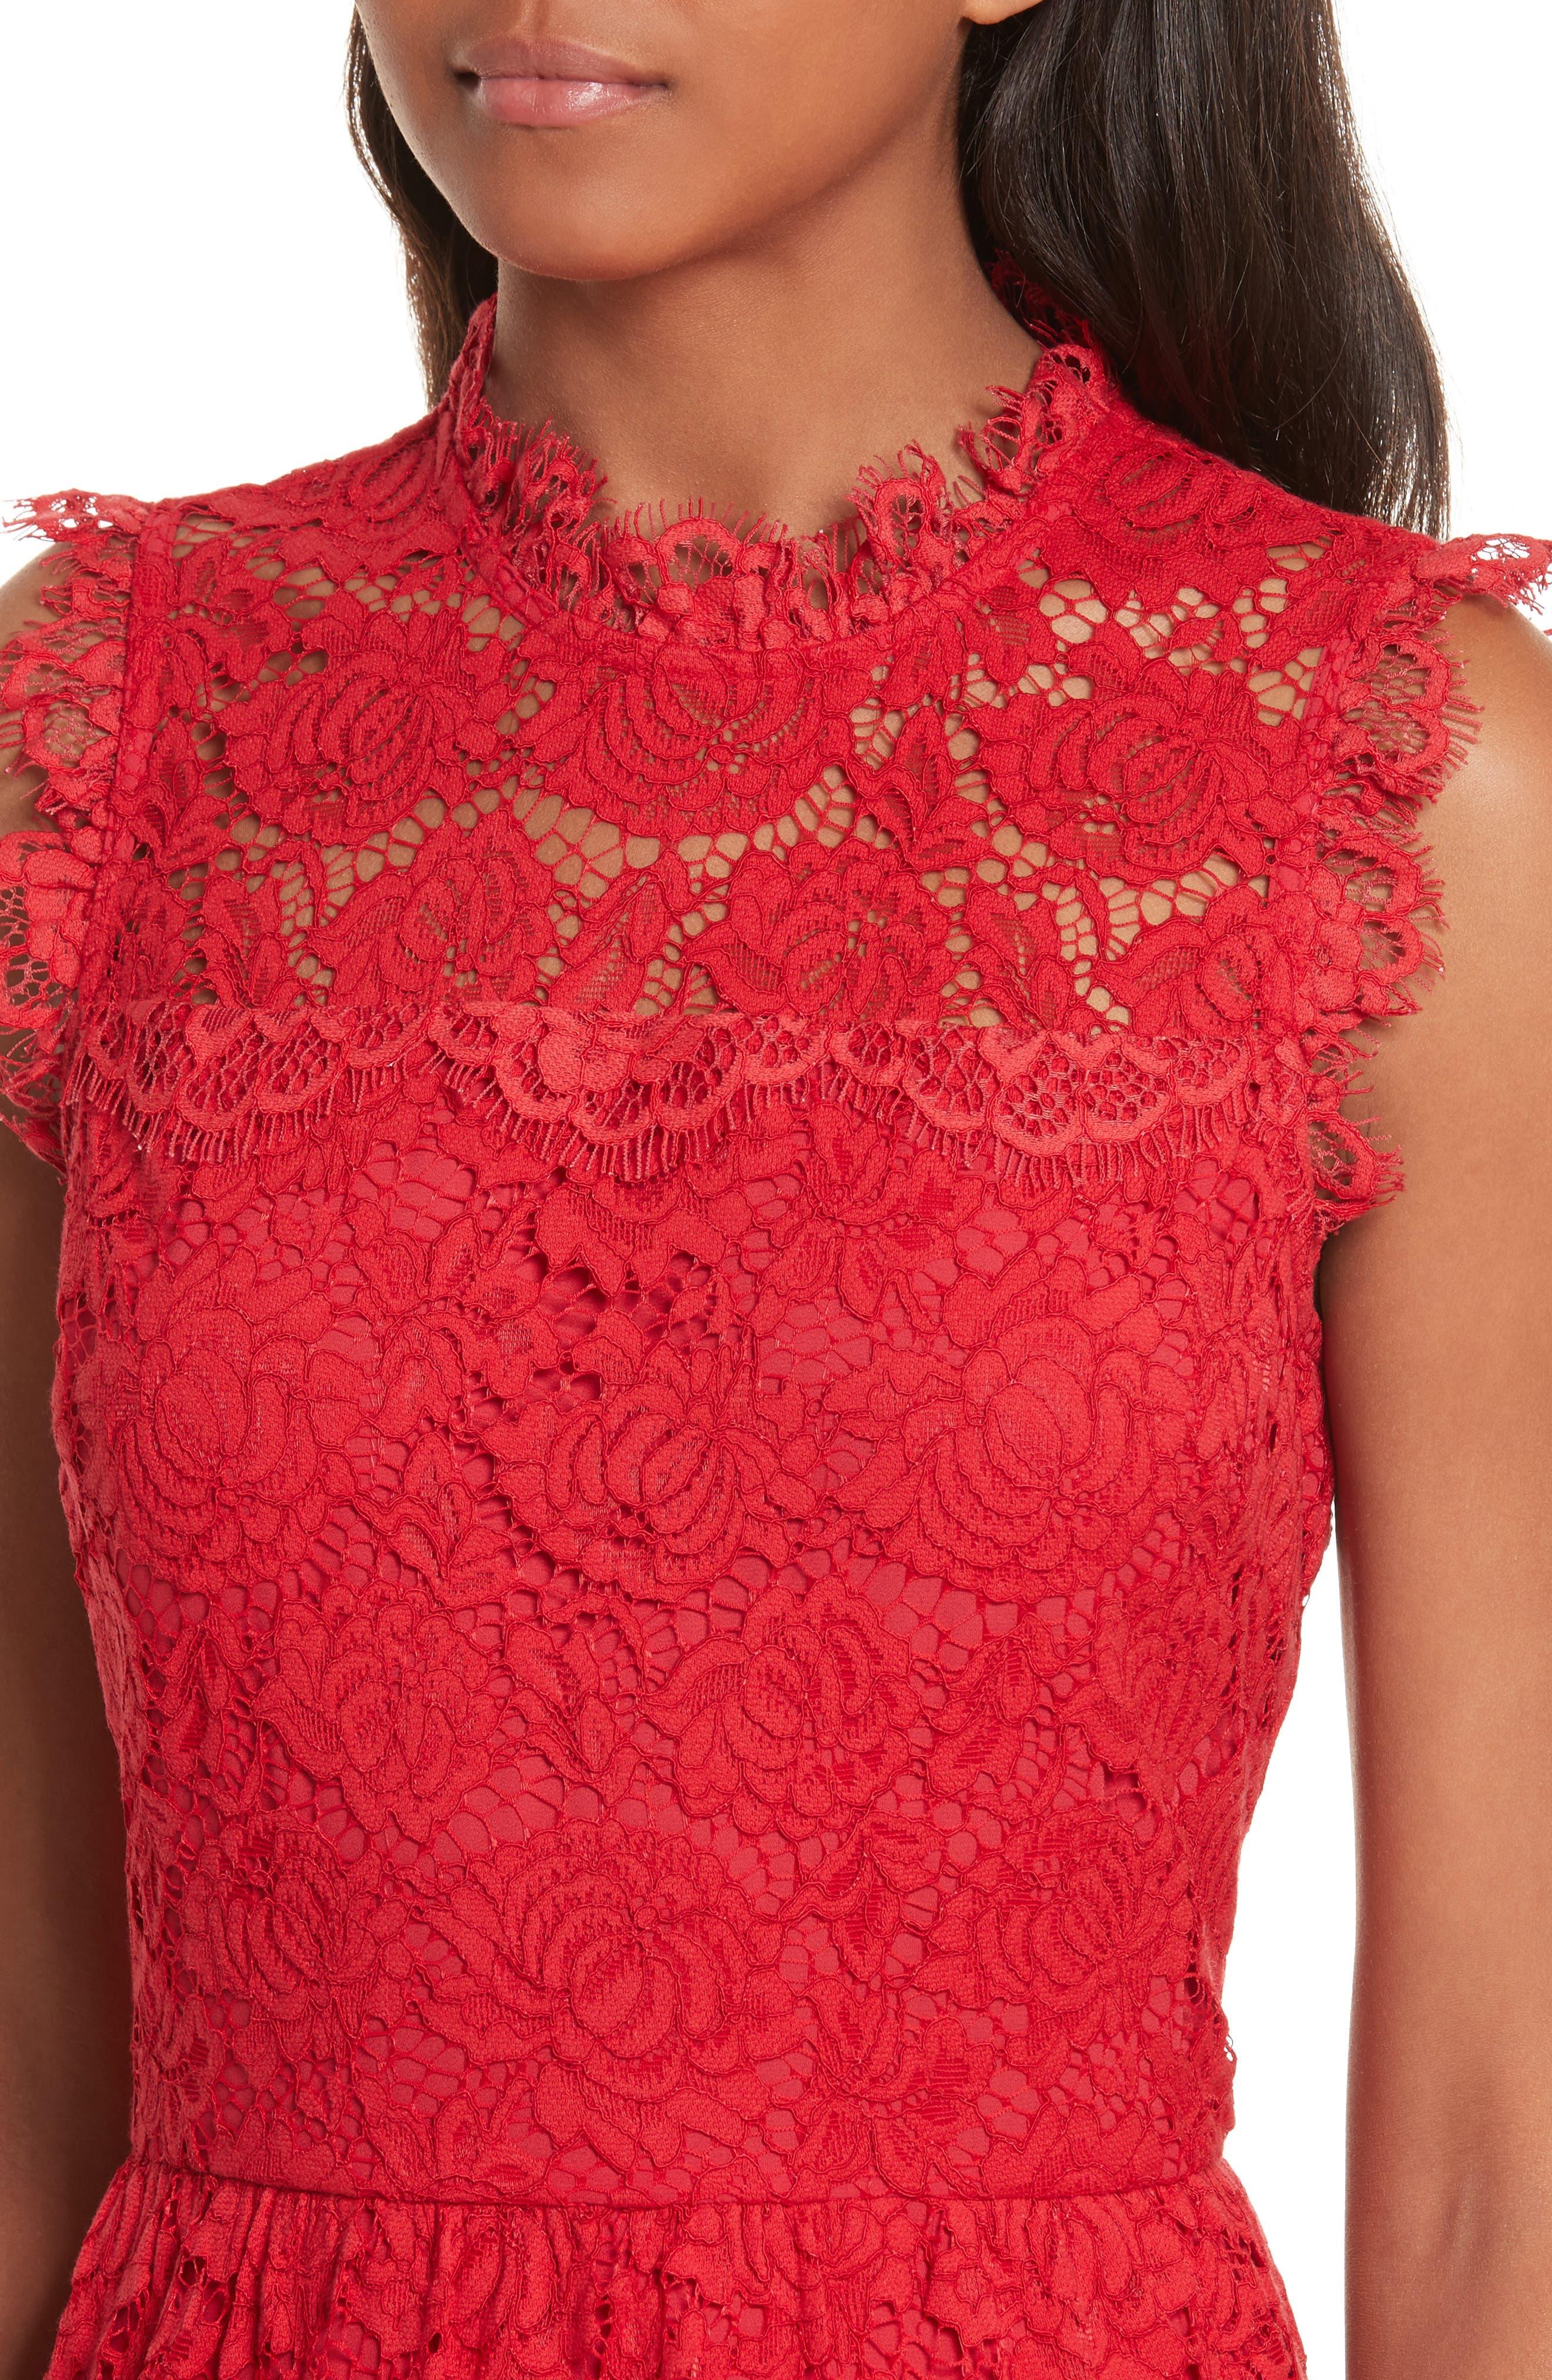 kate spade poppy lace dress,                             Alternate thumbnail 4, color,                             622